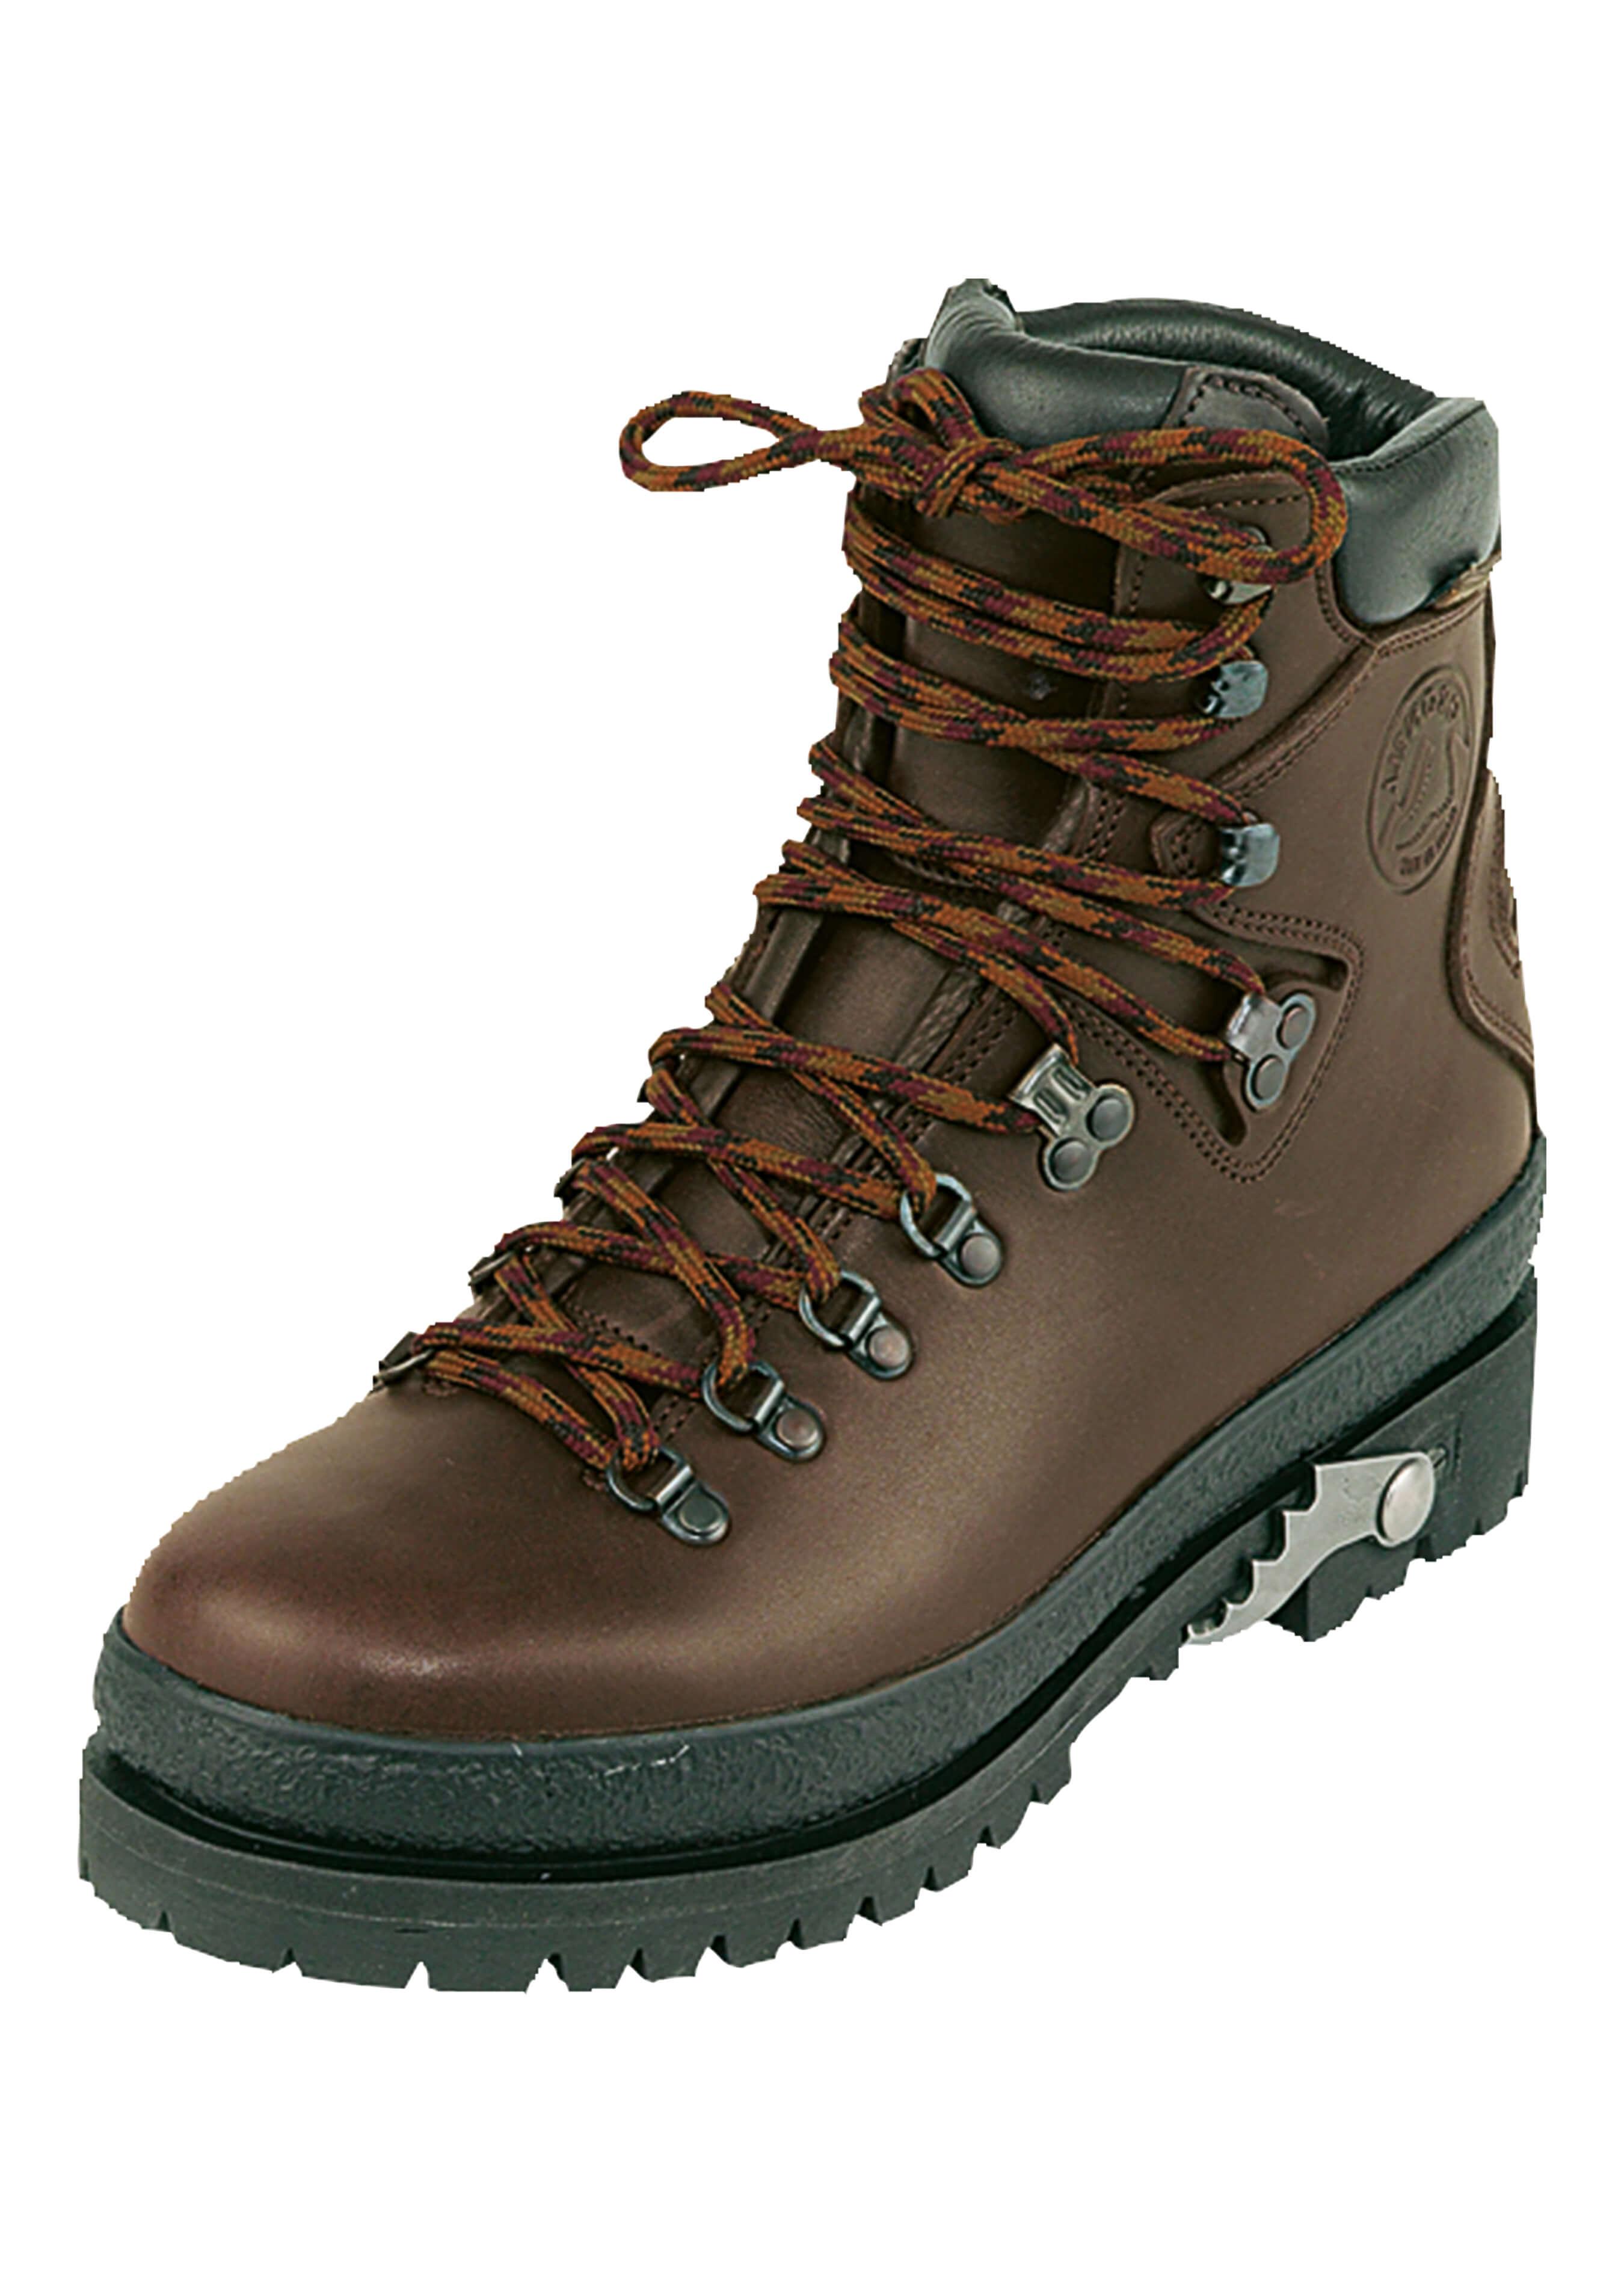 Gro-nell Hard Trekking Schuh Everest L464939 1